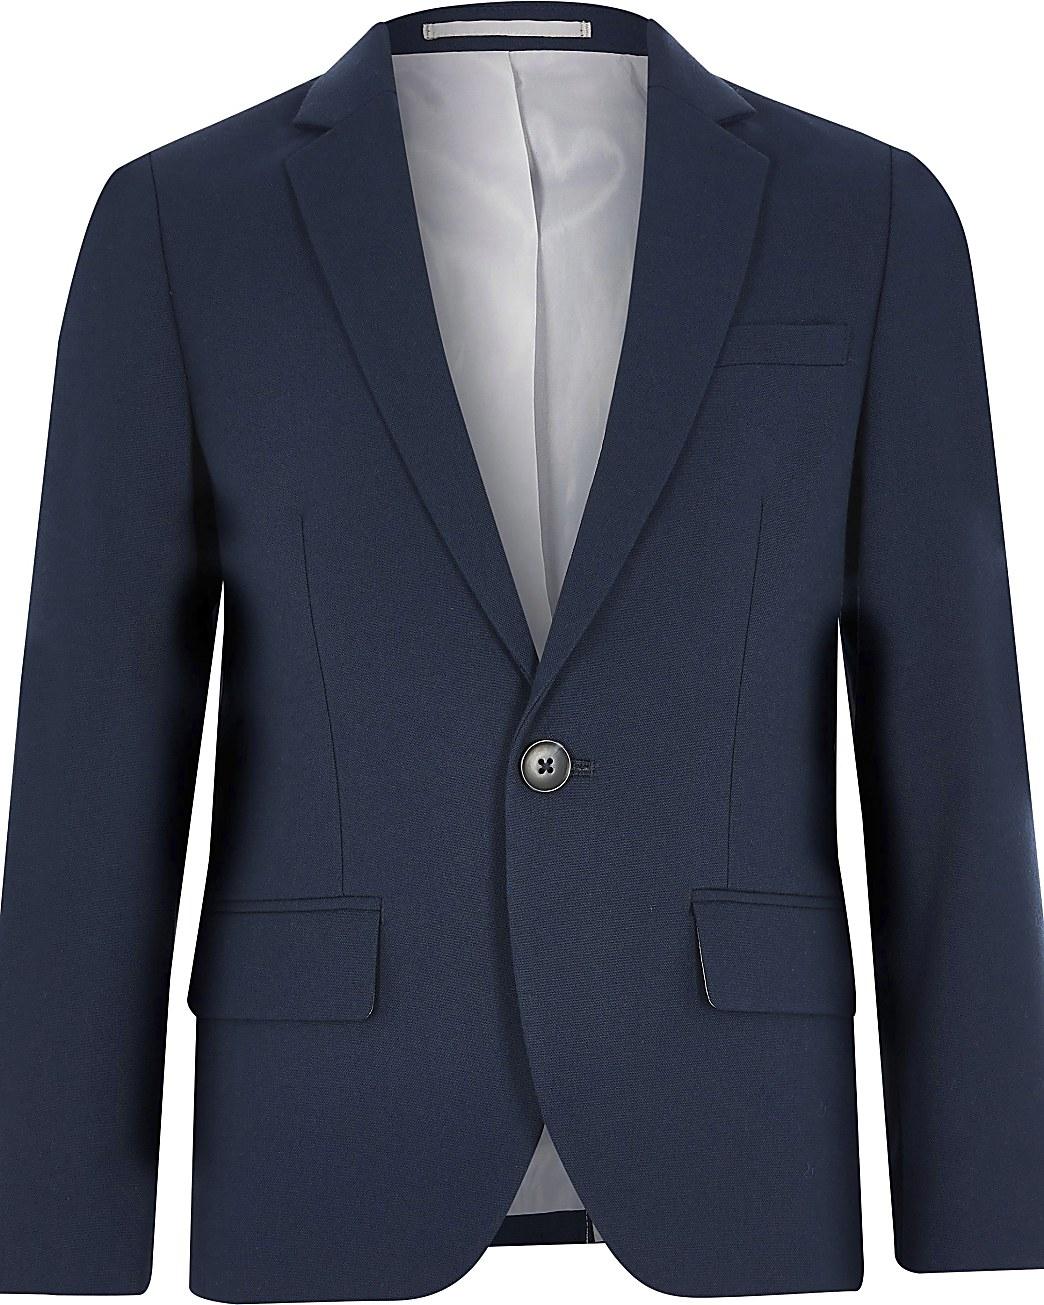 Boys navy suit blazer